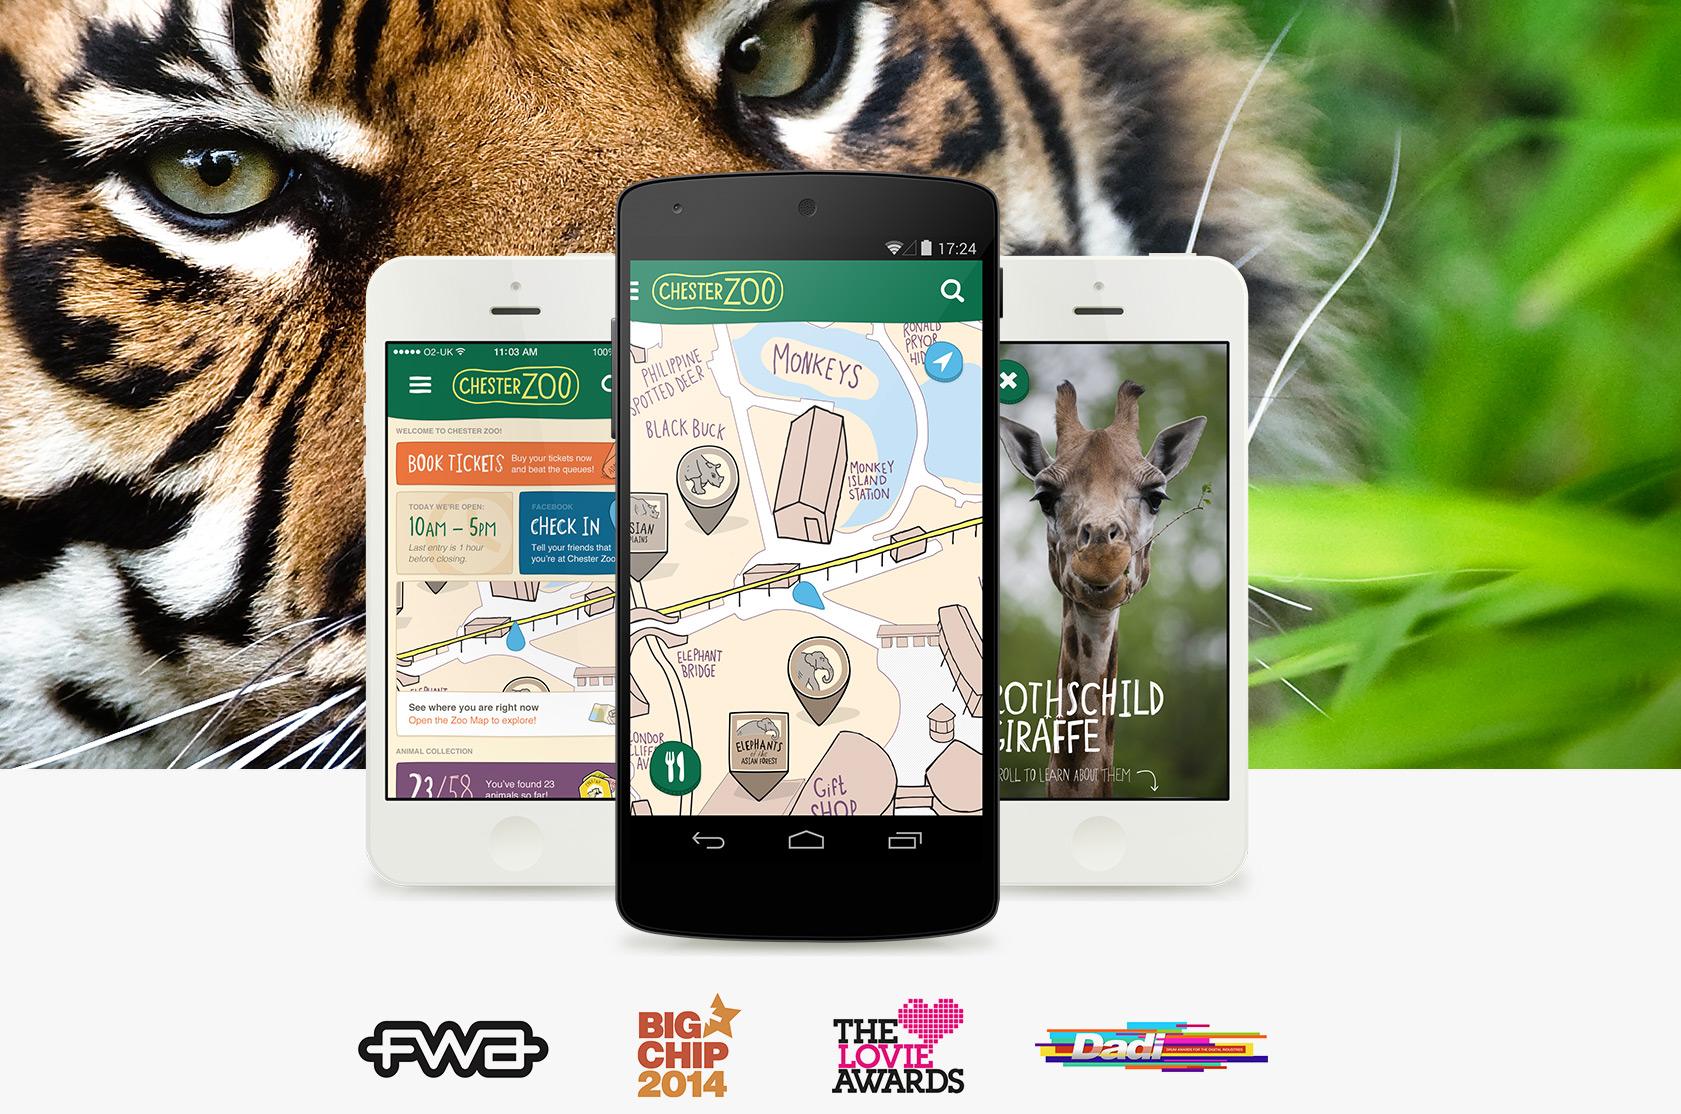 Chester Zoo A multi award-winning mobile app